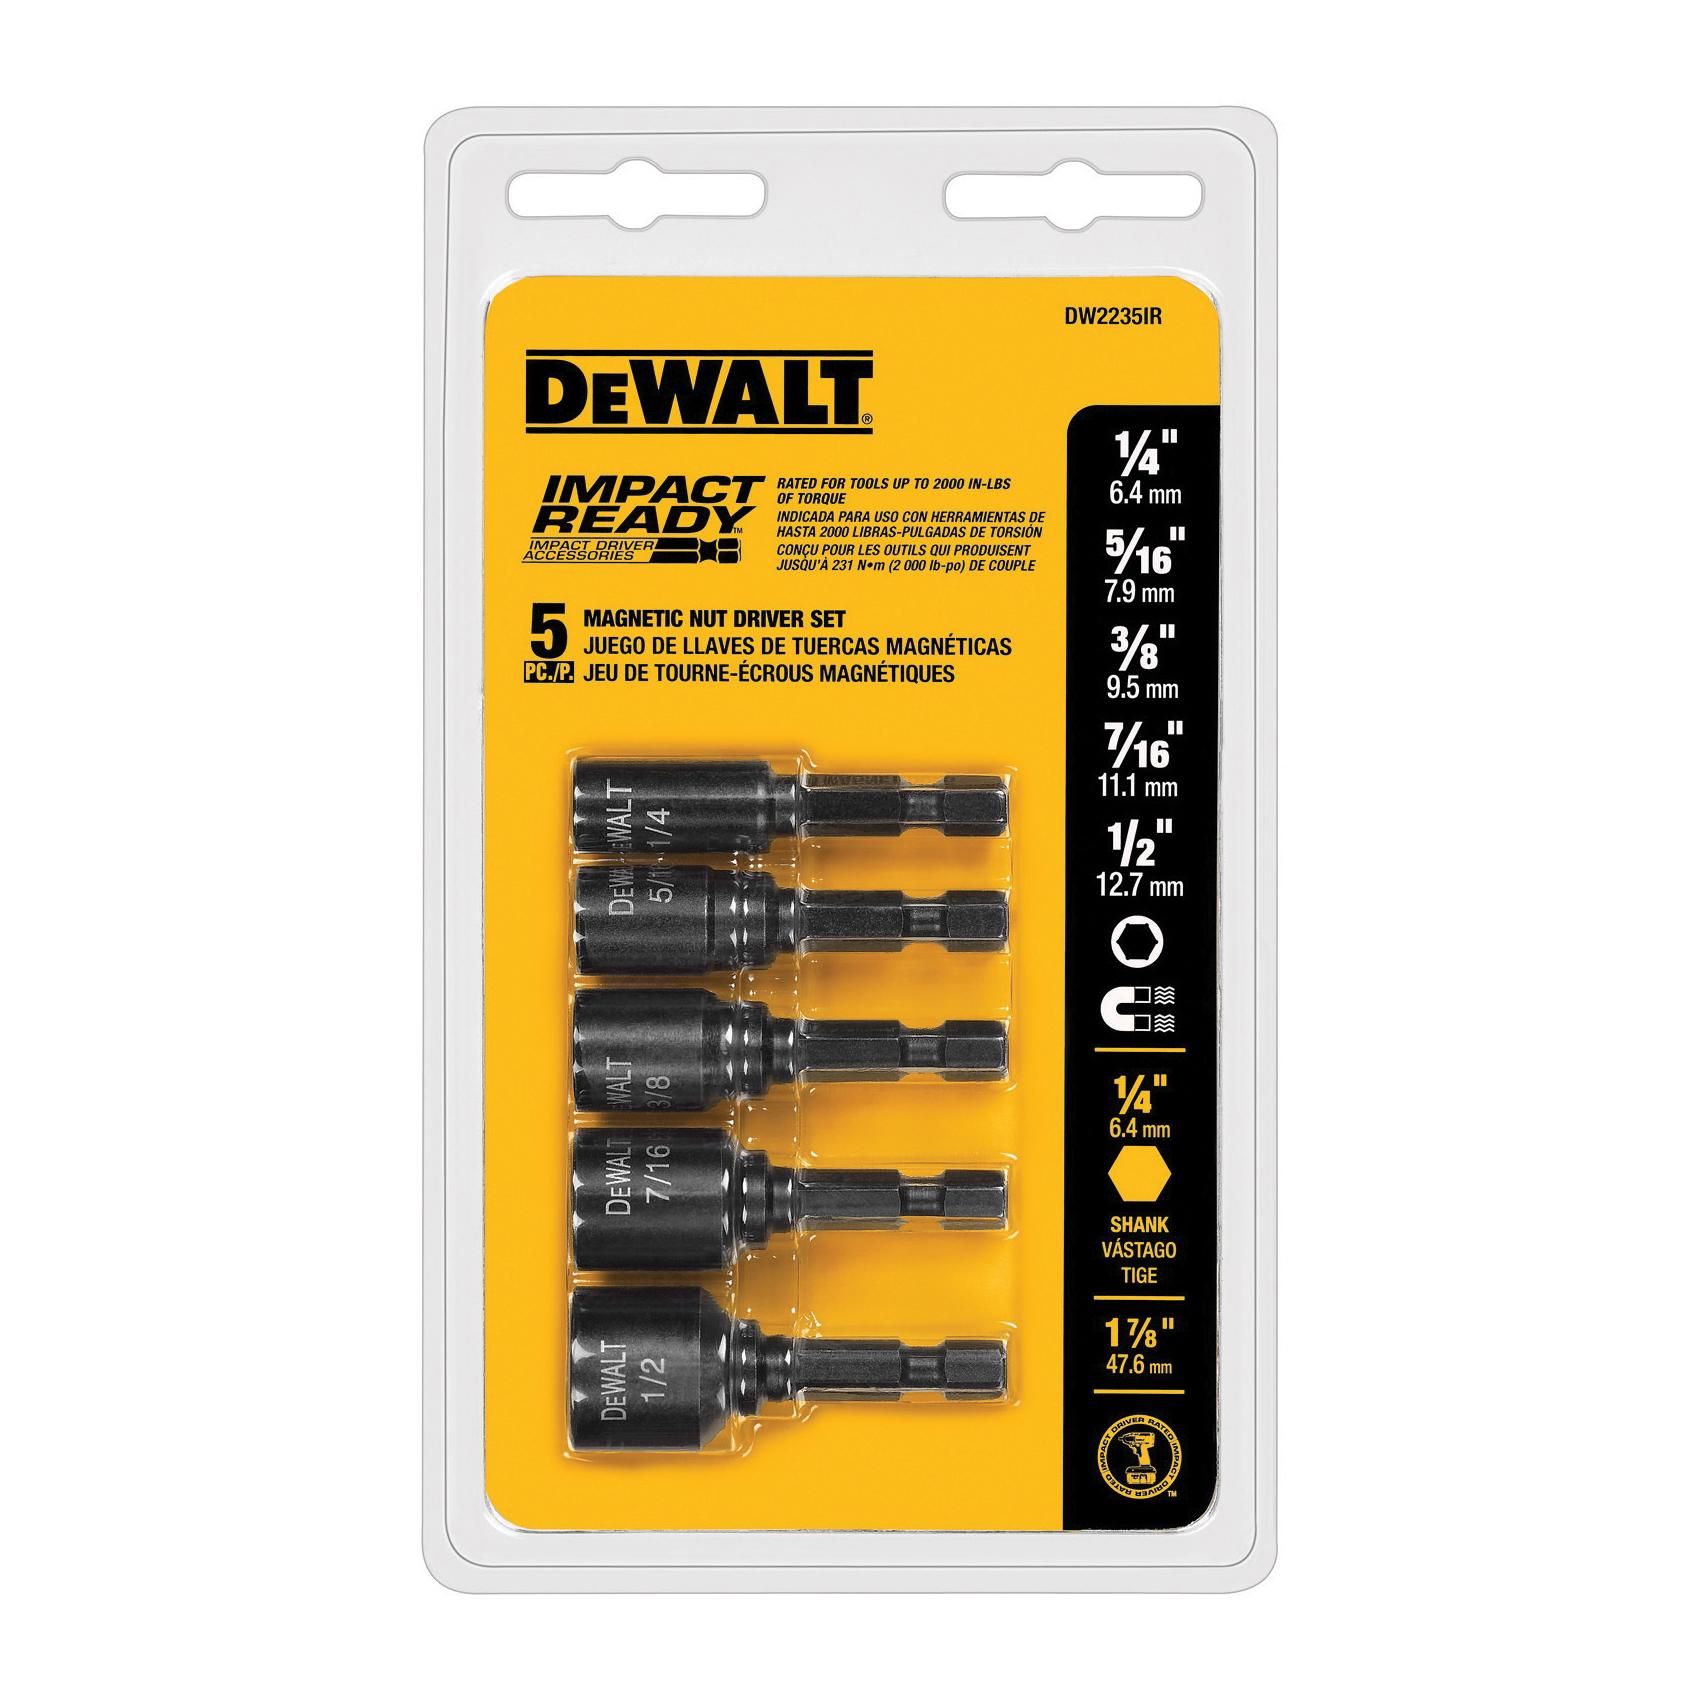 DeWALT_DW2235IR